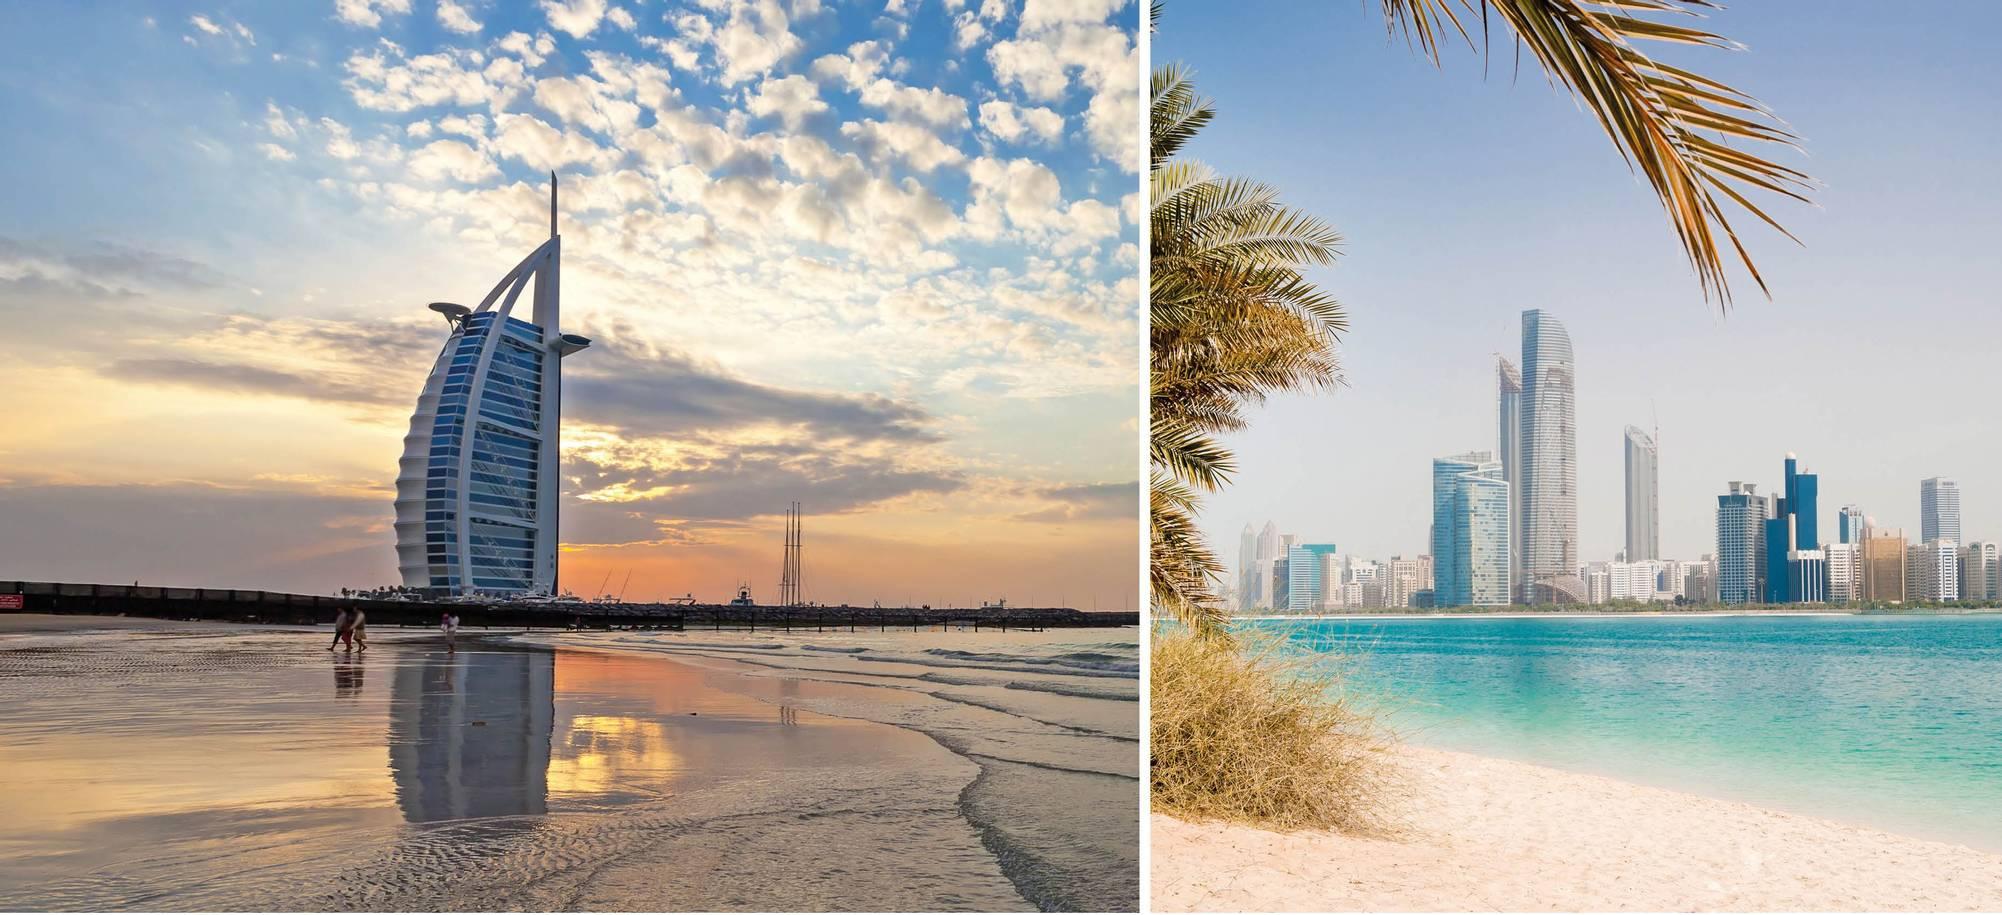 Web_Images_Dubai.jpg